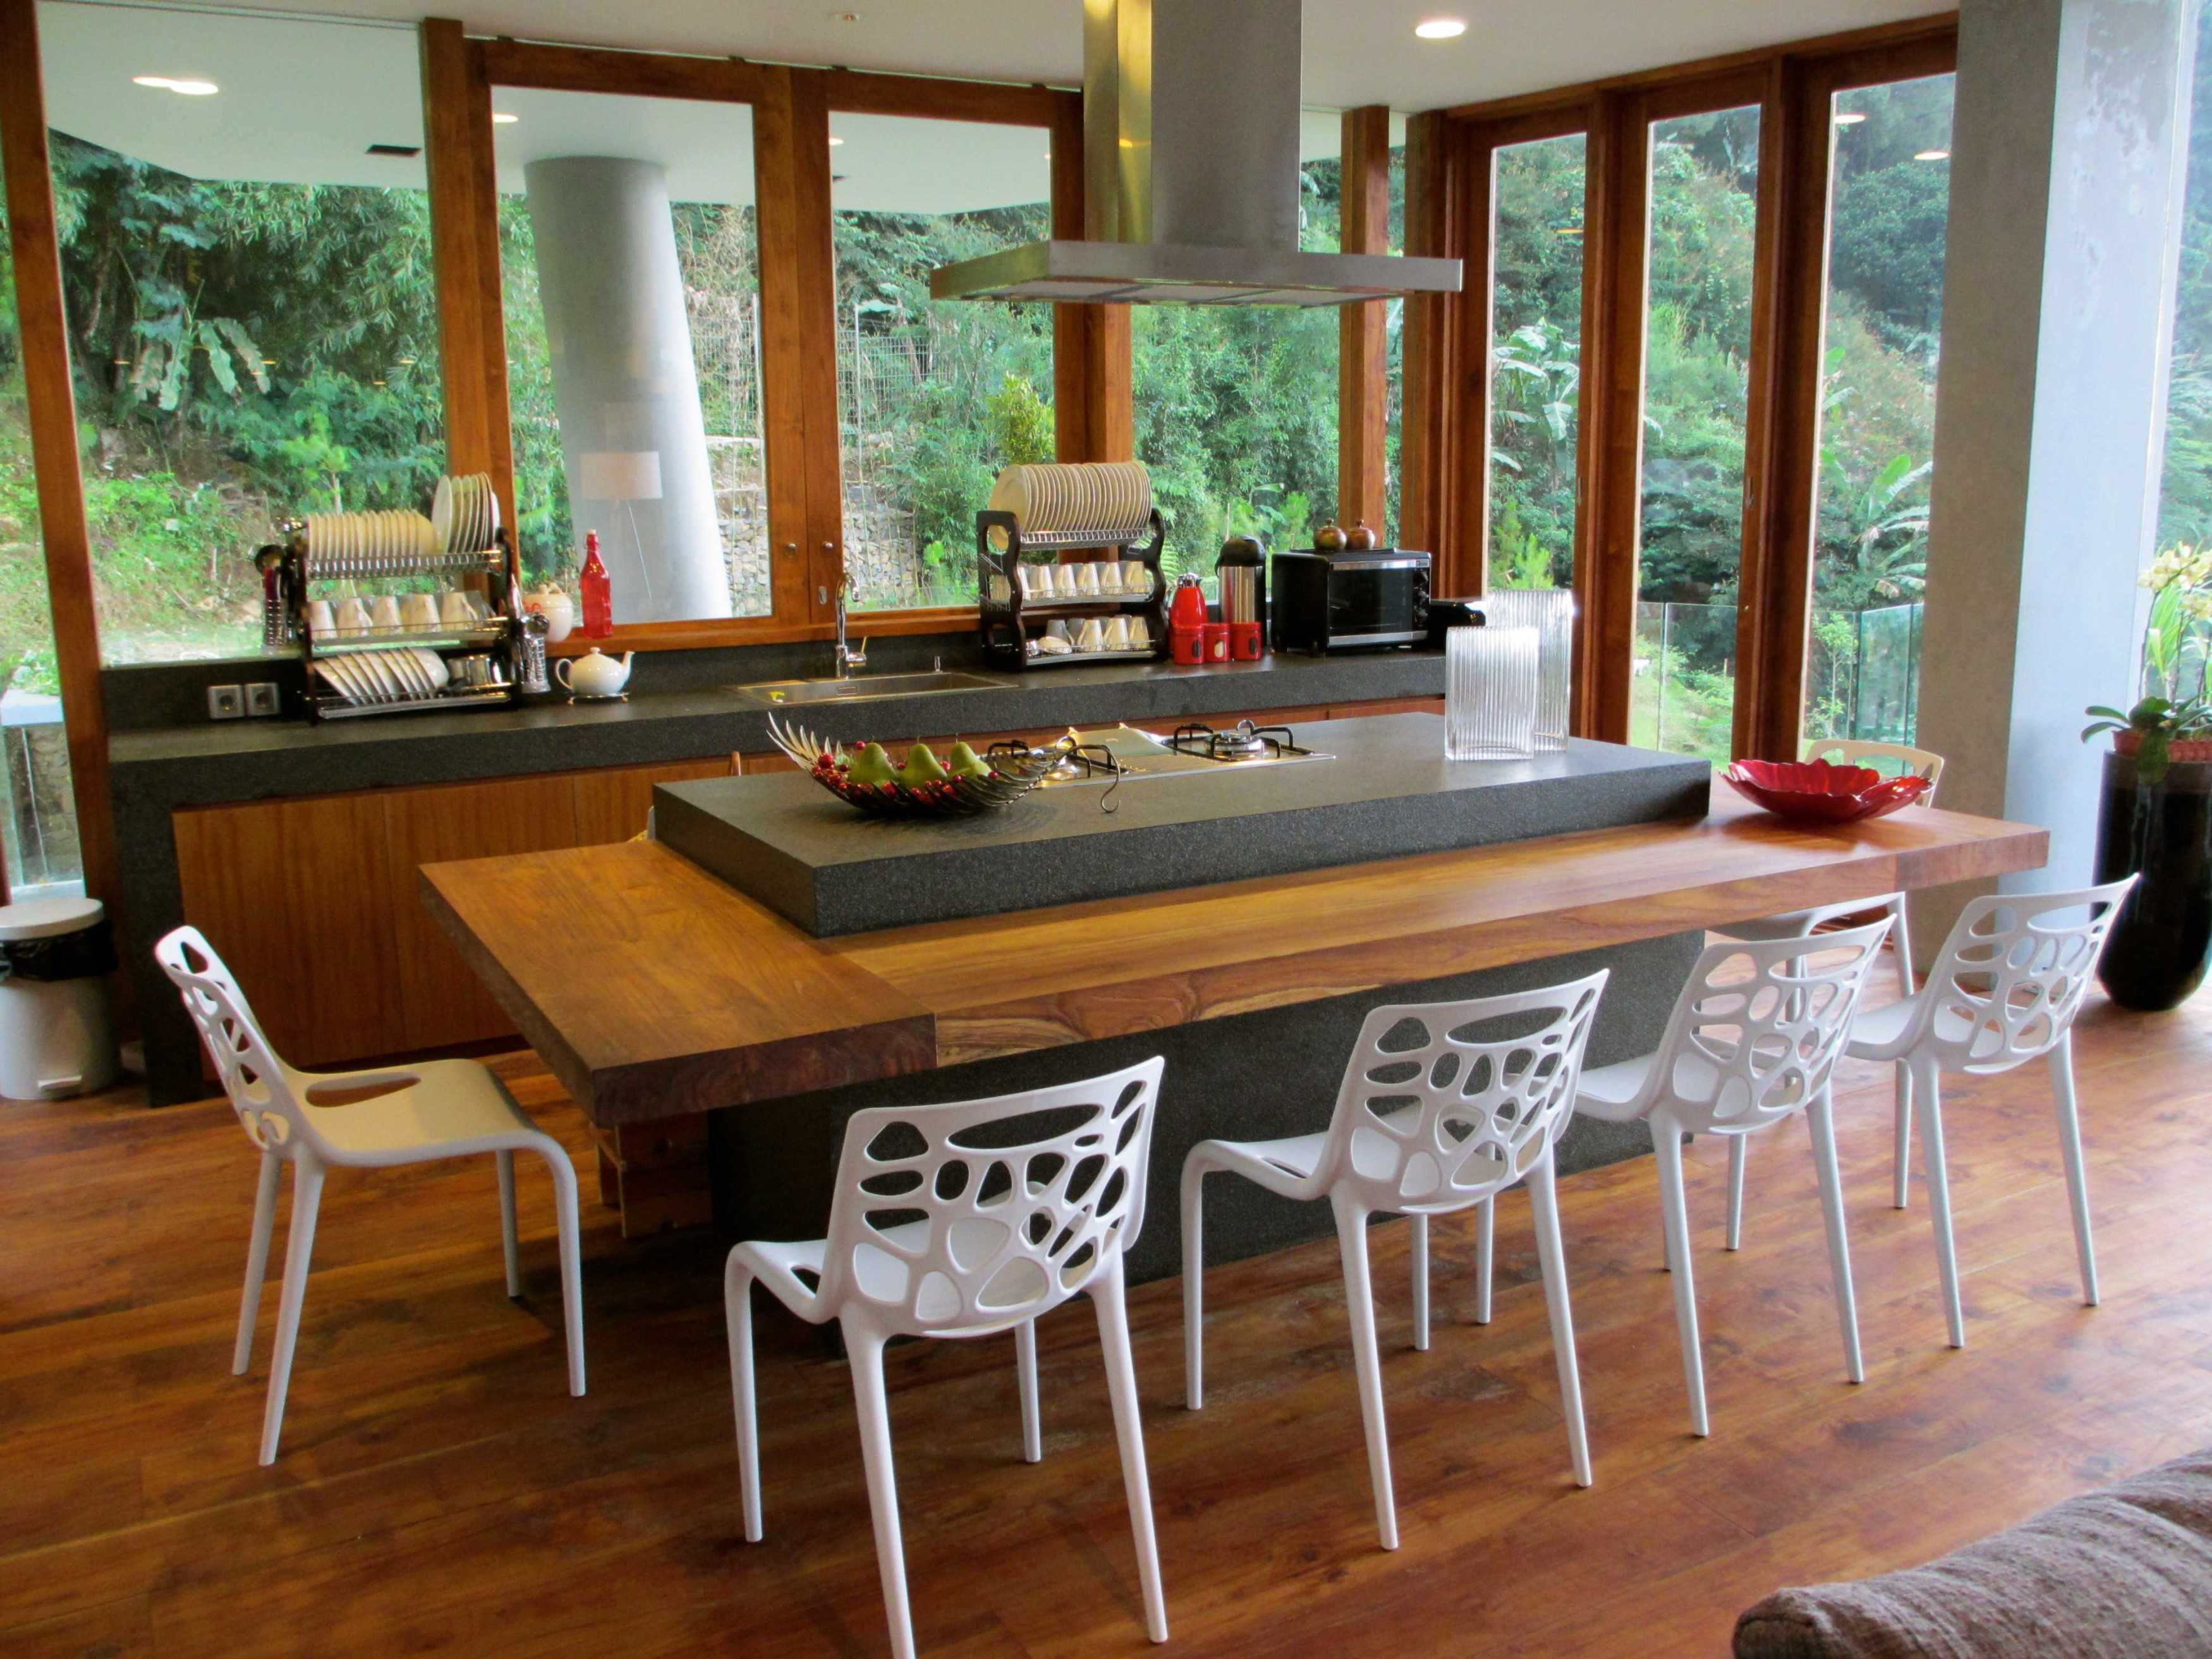 Rudy Dodo Private Villa Cilember, Puncak - Bogor Cilember, Puncak - Bogor Dining Room   9184